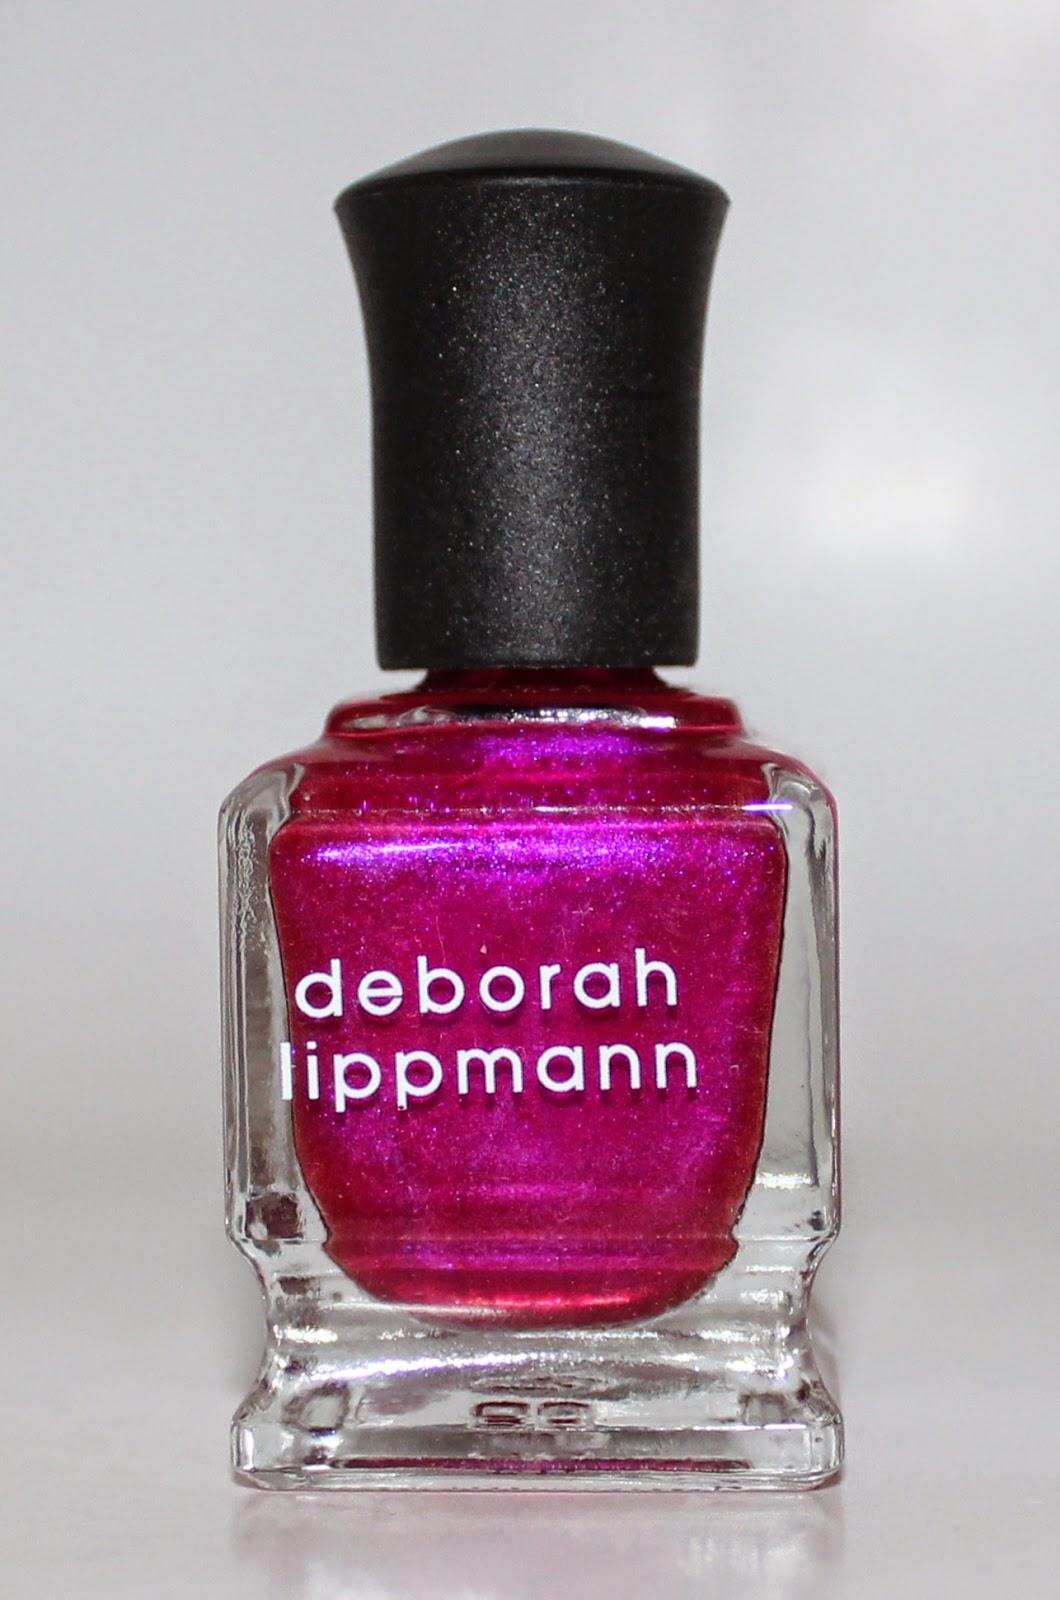 Deborah Lippmann Dear Mr. Fantasy